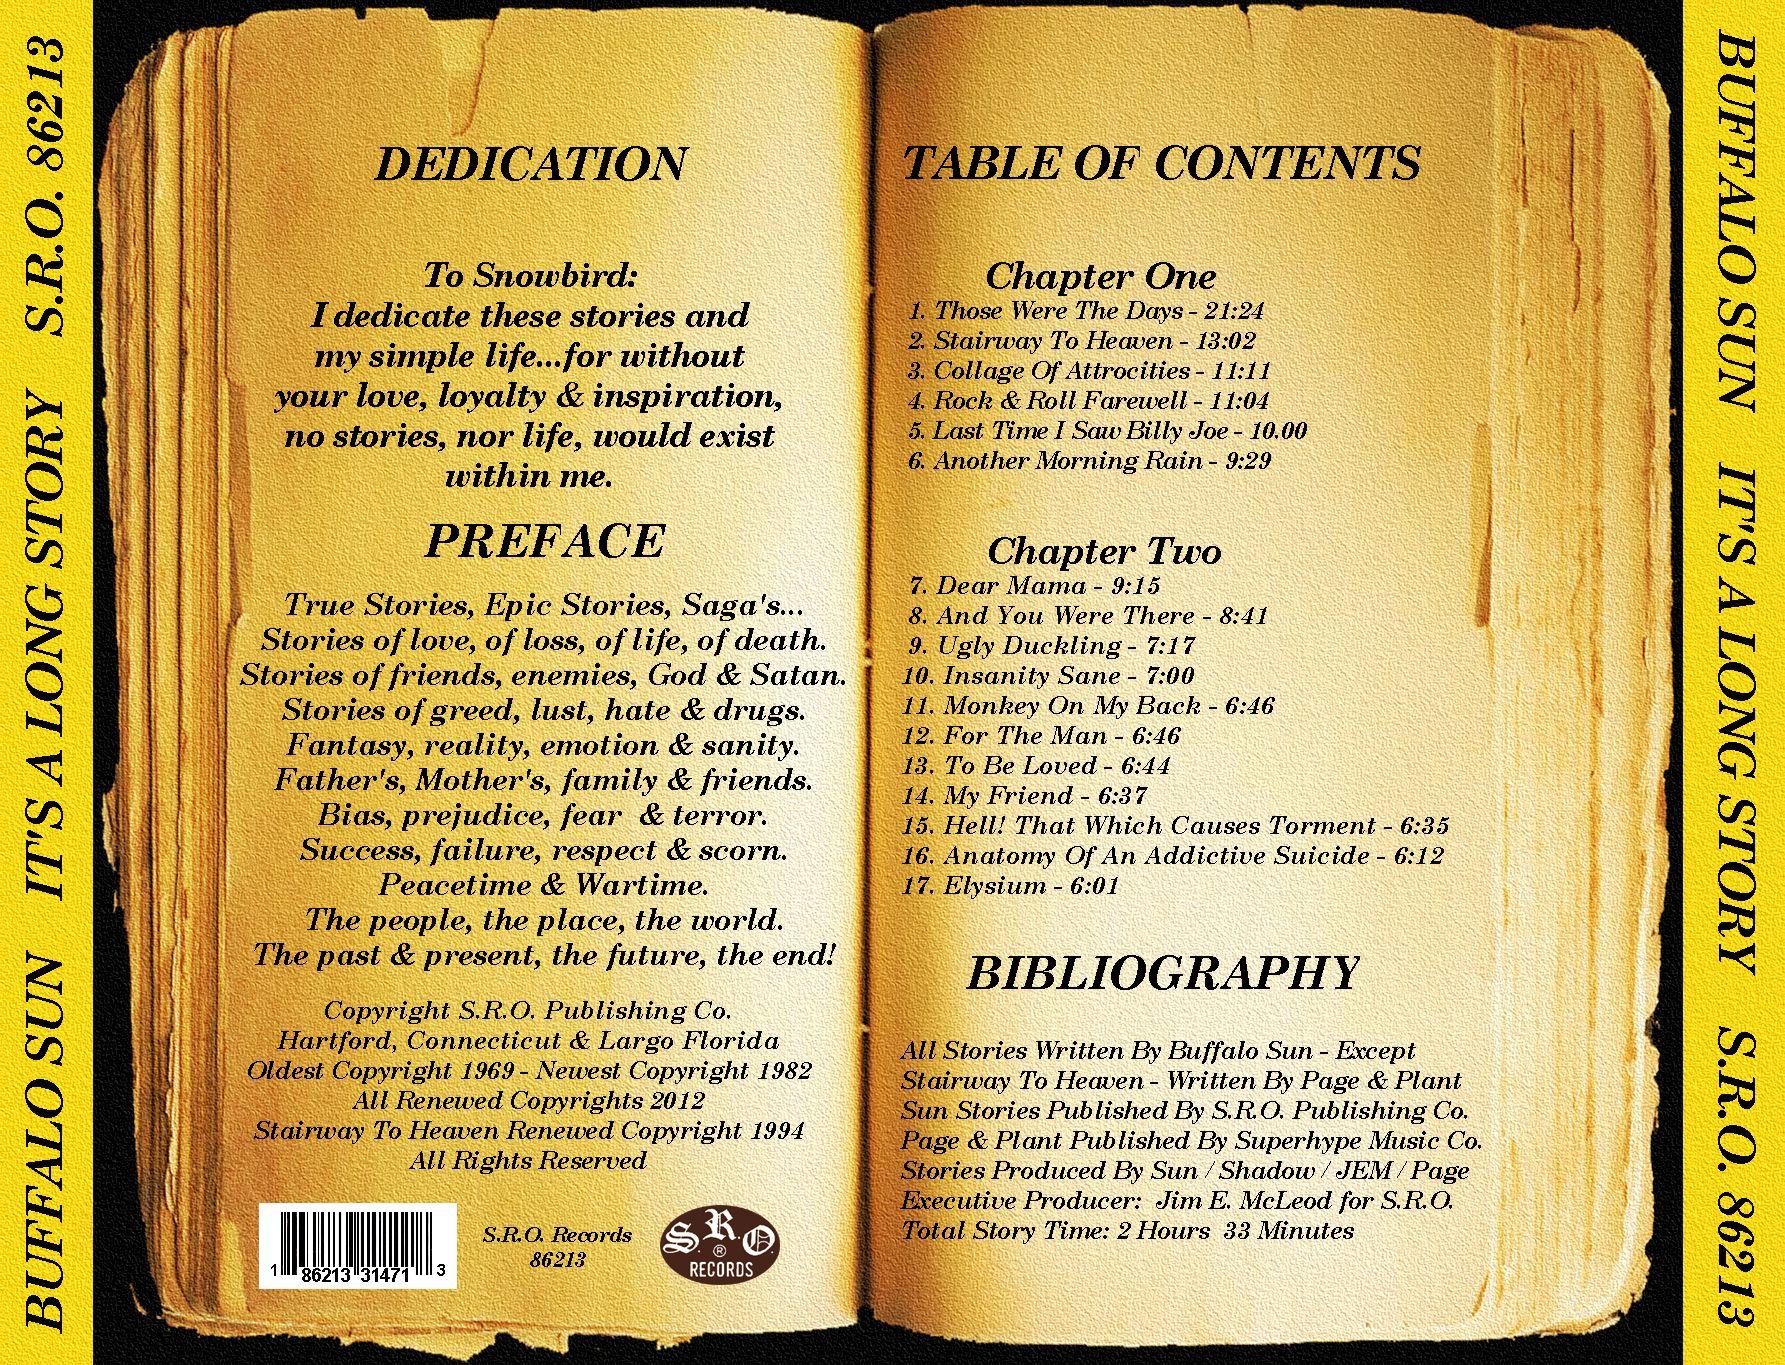 Buffalo Sun It S A Long Story S R O Records 86213 Side B Buffalo Chapter One Long Stories